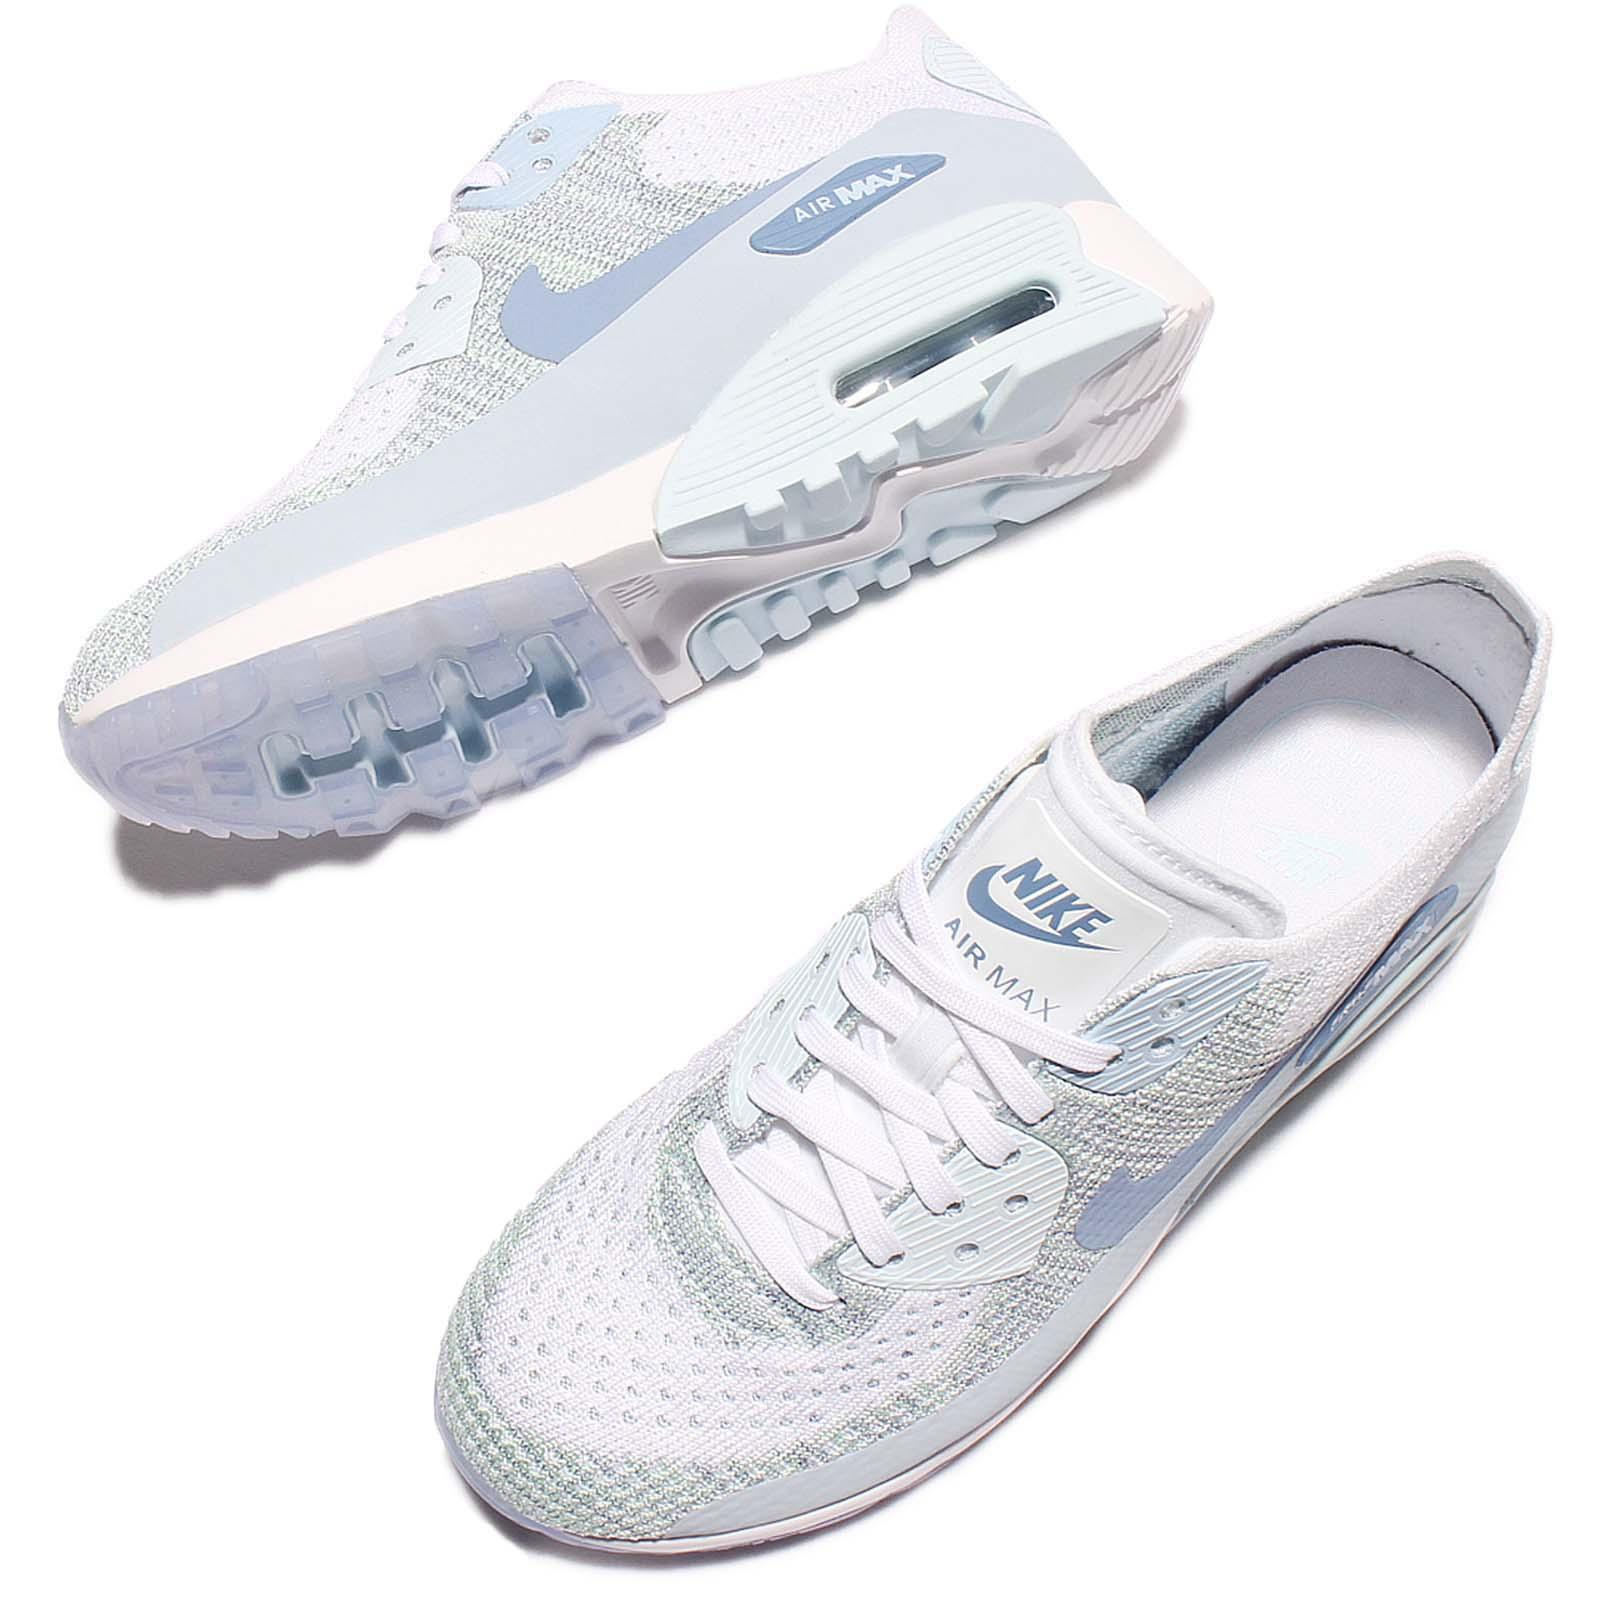 Nike Air Max 90 Zapatos De Mujer De Ultra Flyknit az8kck3oh